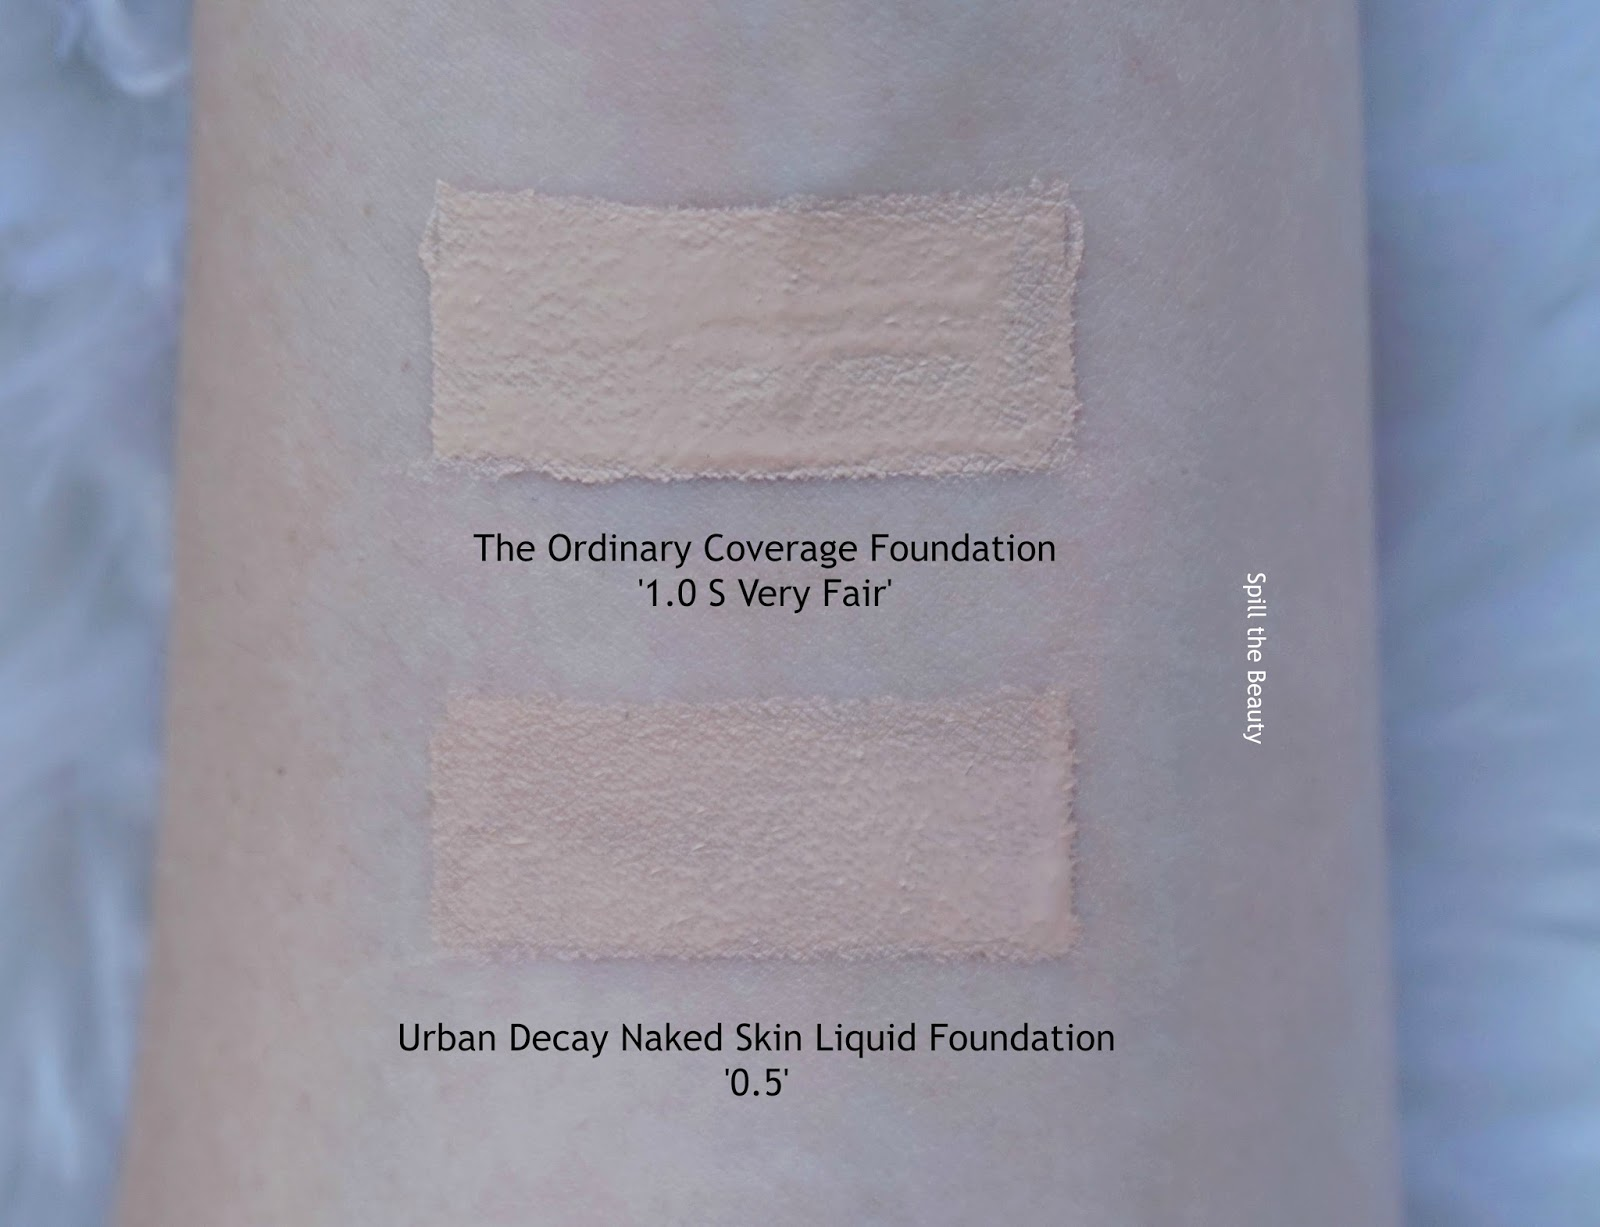 deciem the ordinary deciem high coverage foundation 1.0 s very fair review swatches comparison urban decay